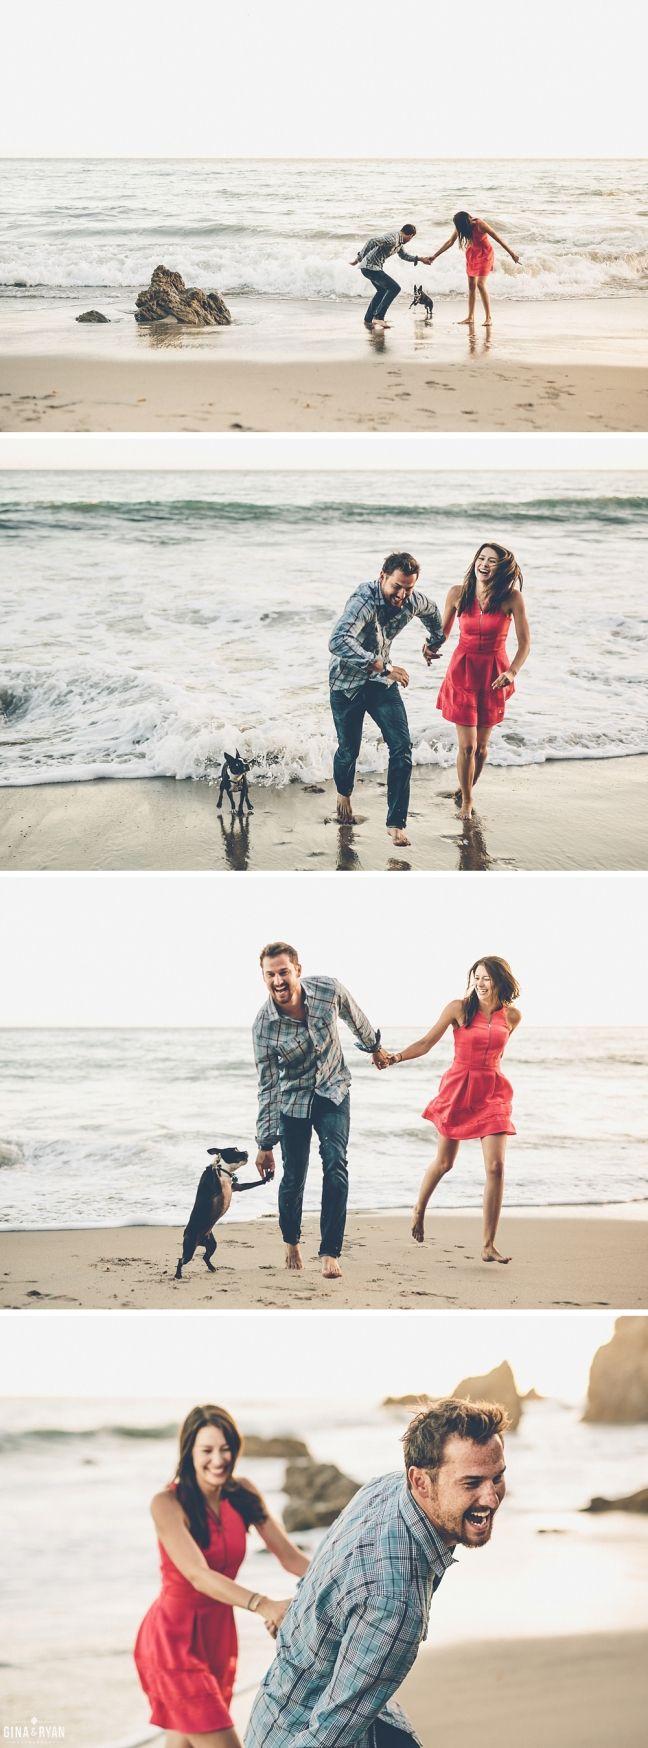 So fun and beautiful | Matador Beach Engagement Session Photos | Los Angeles Wedding Photography